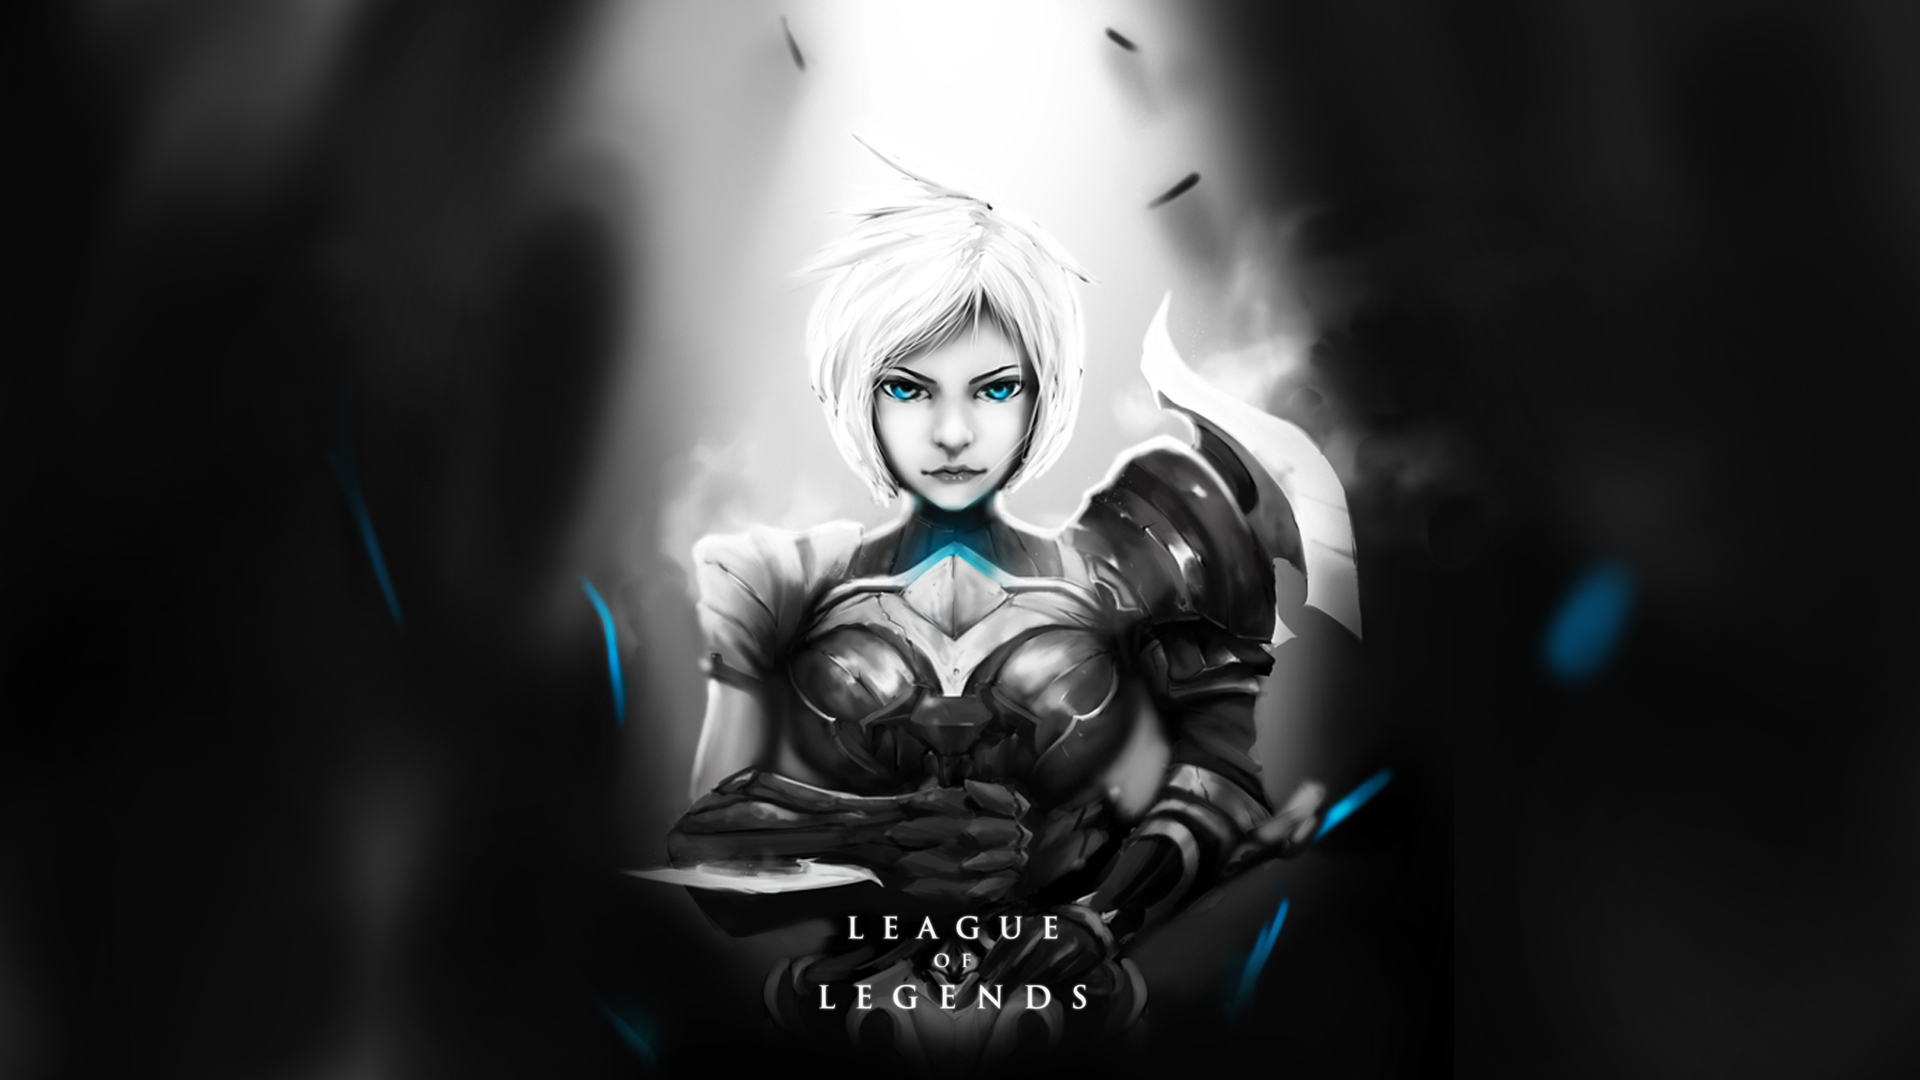 League of Legends wallpaper 104